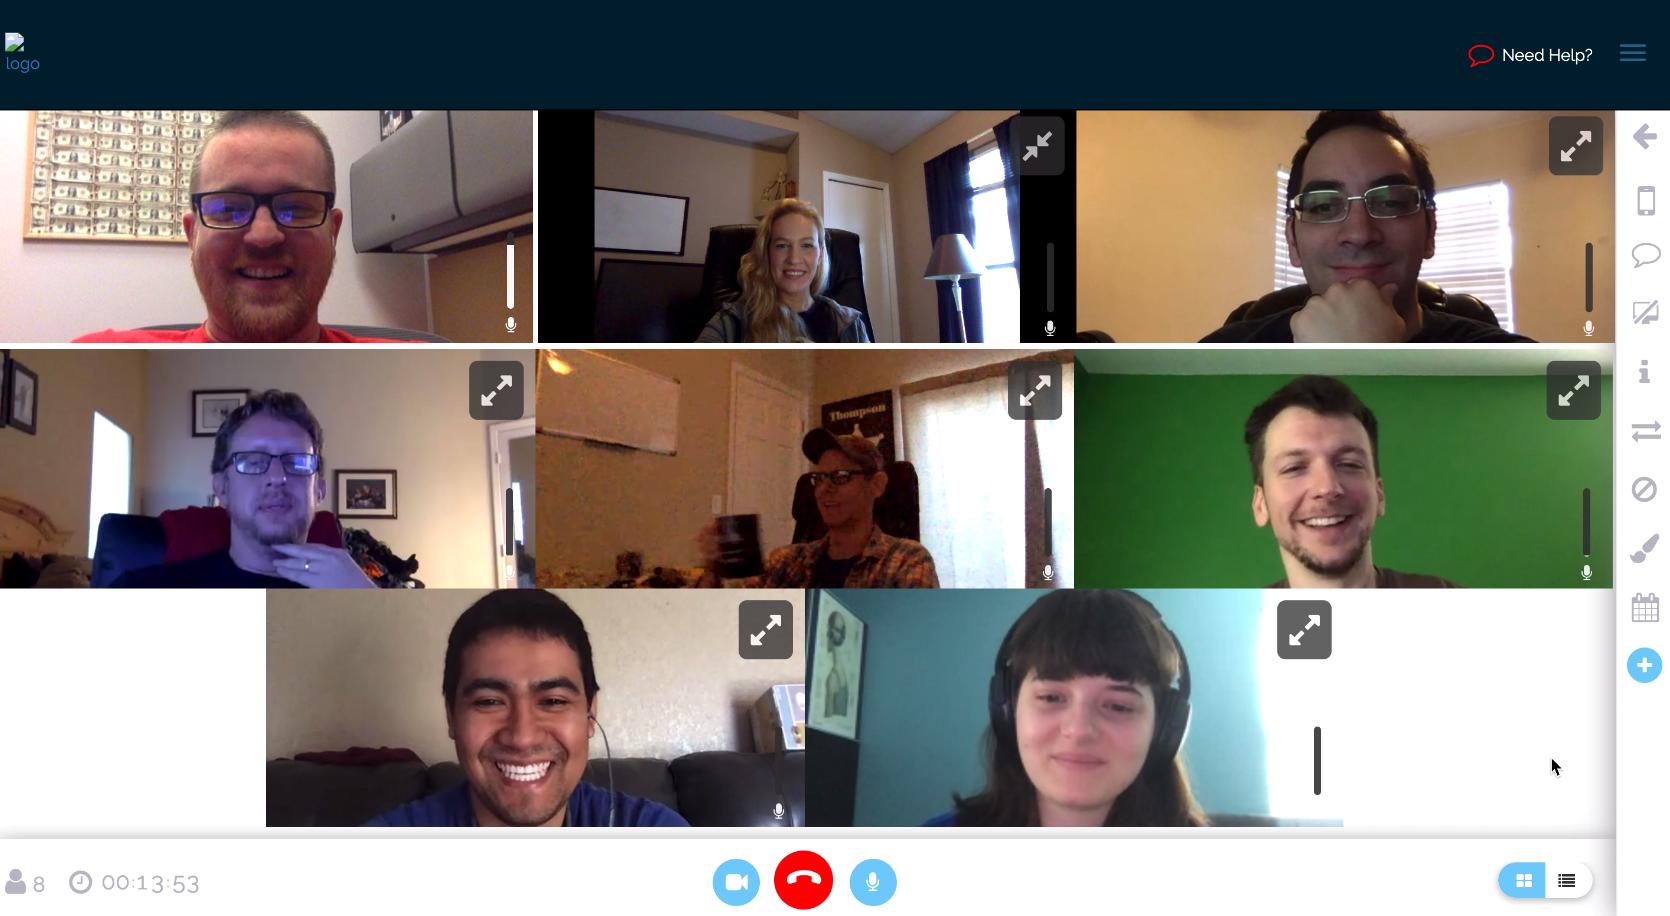 Group-Video-Screenshot.png